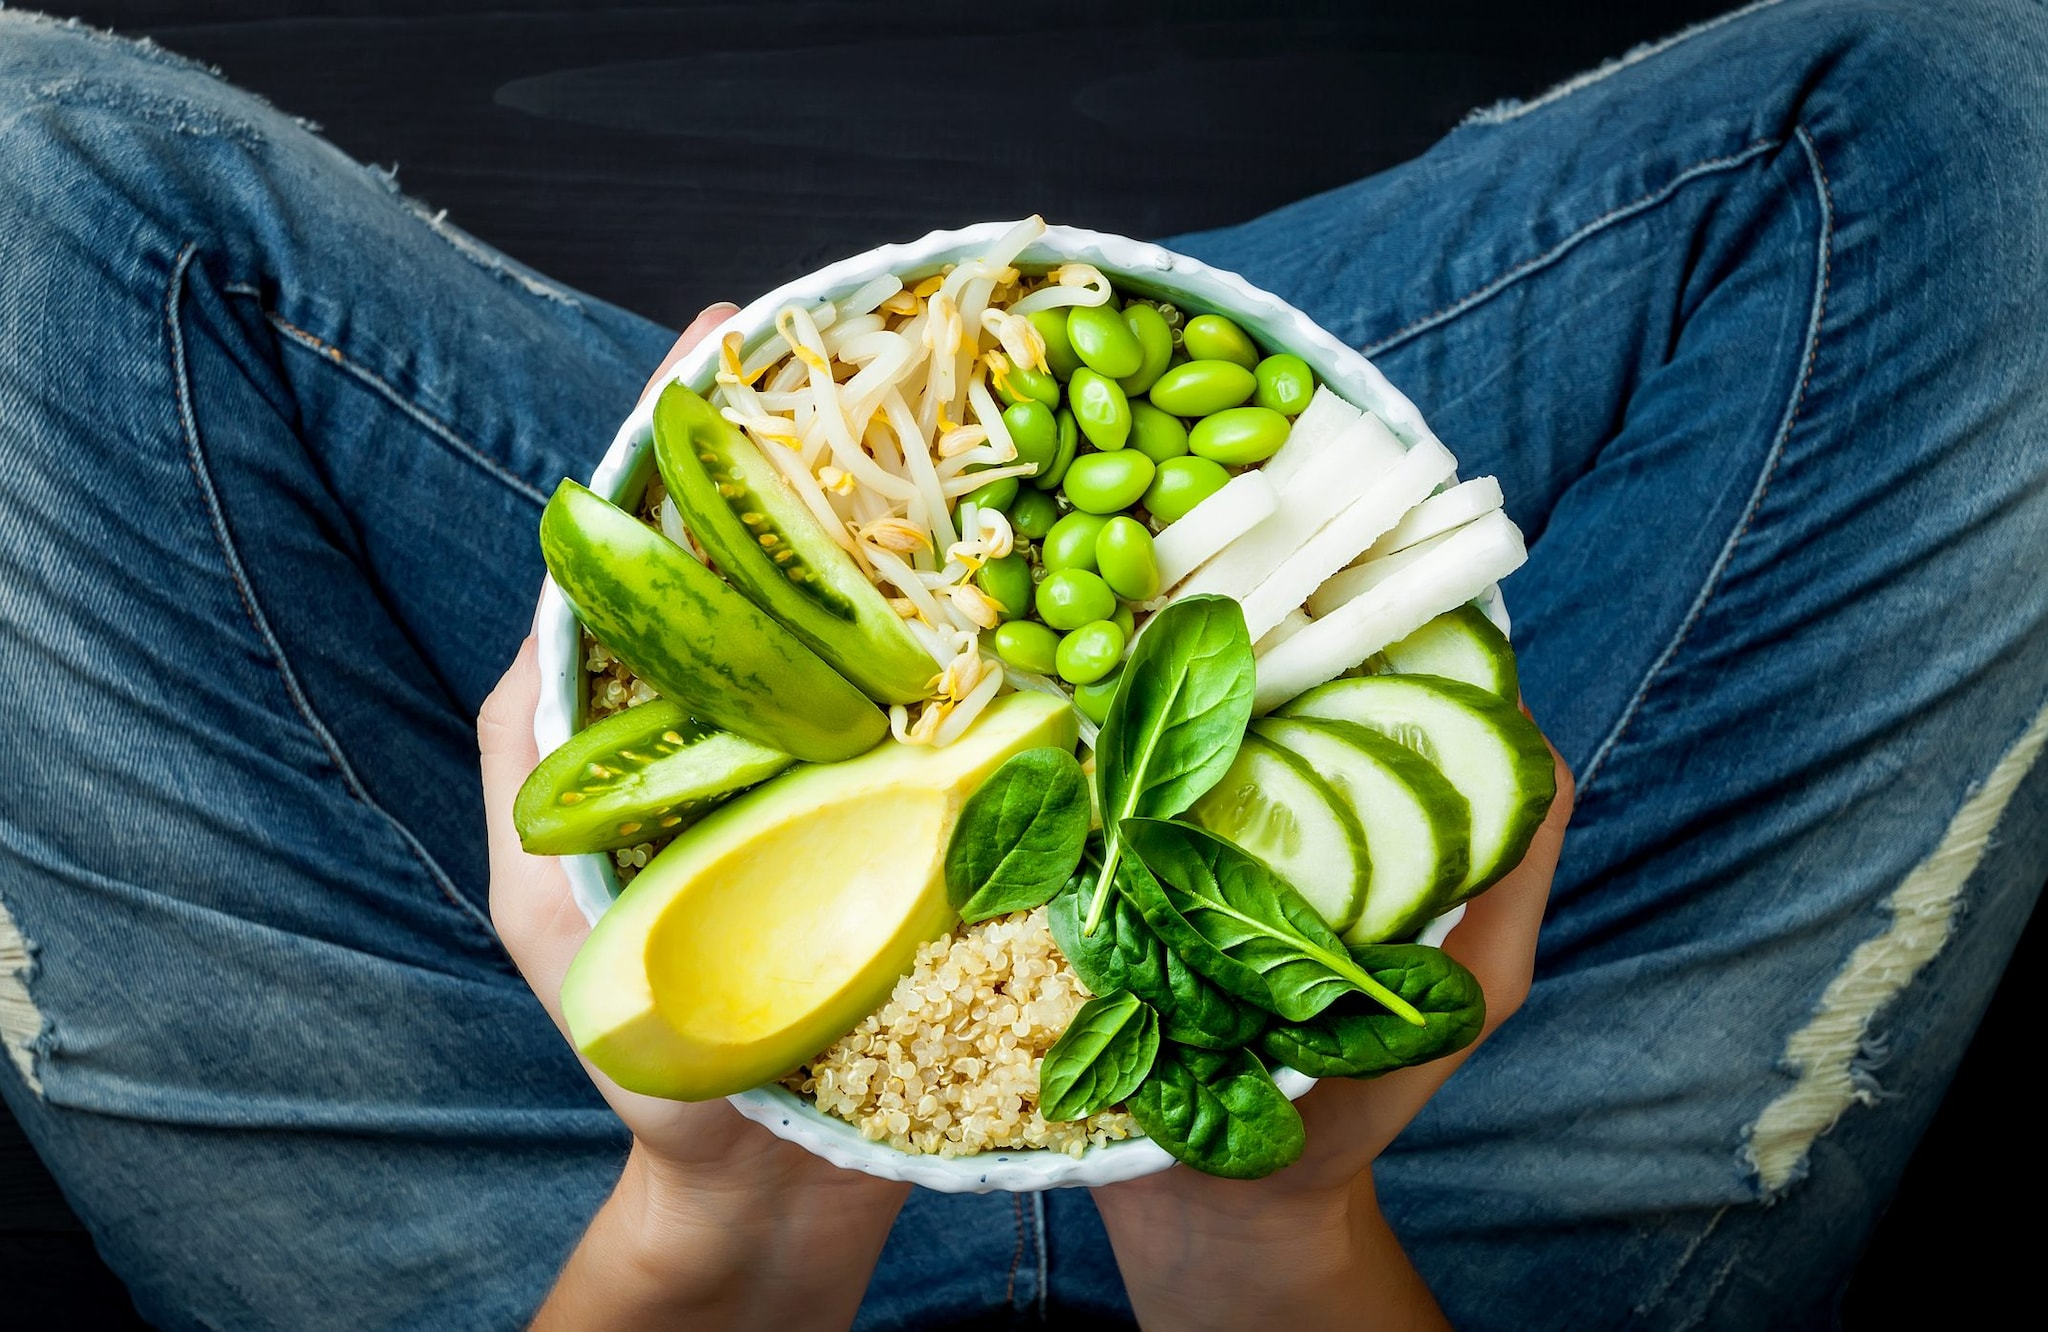 raw-veggies